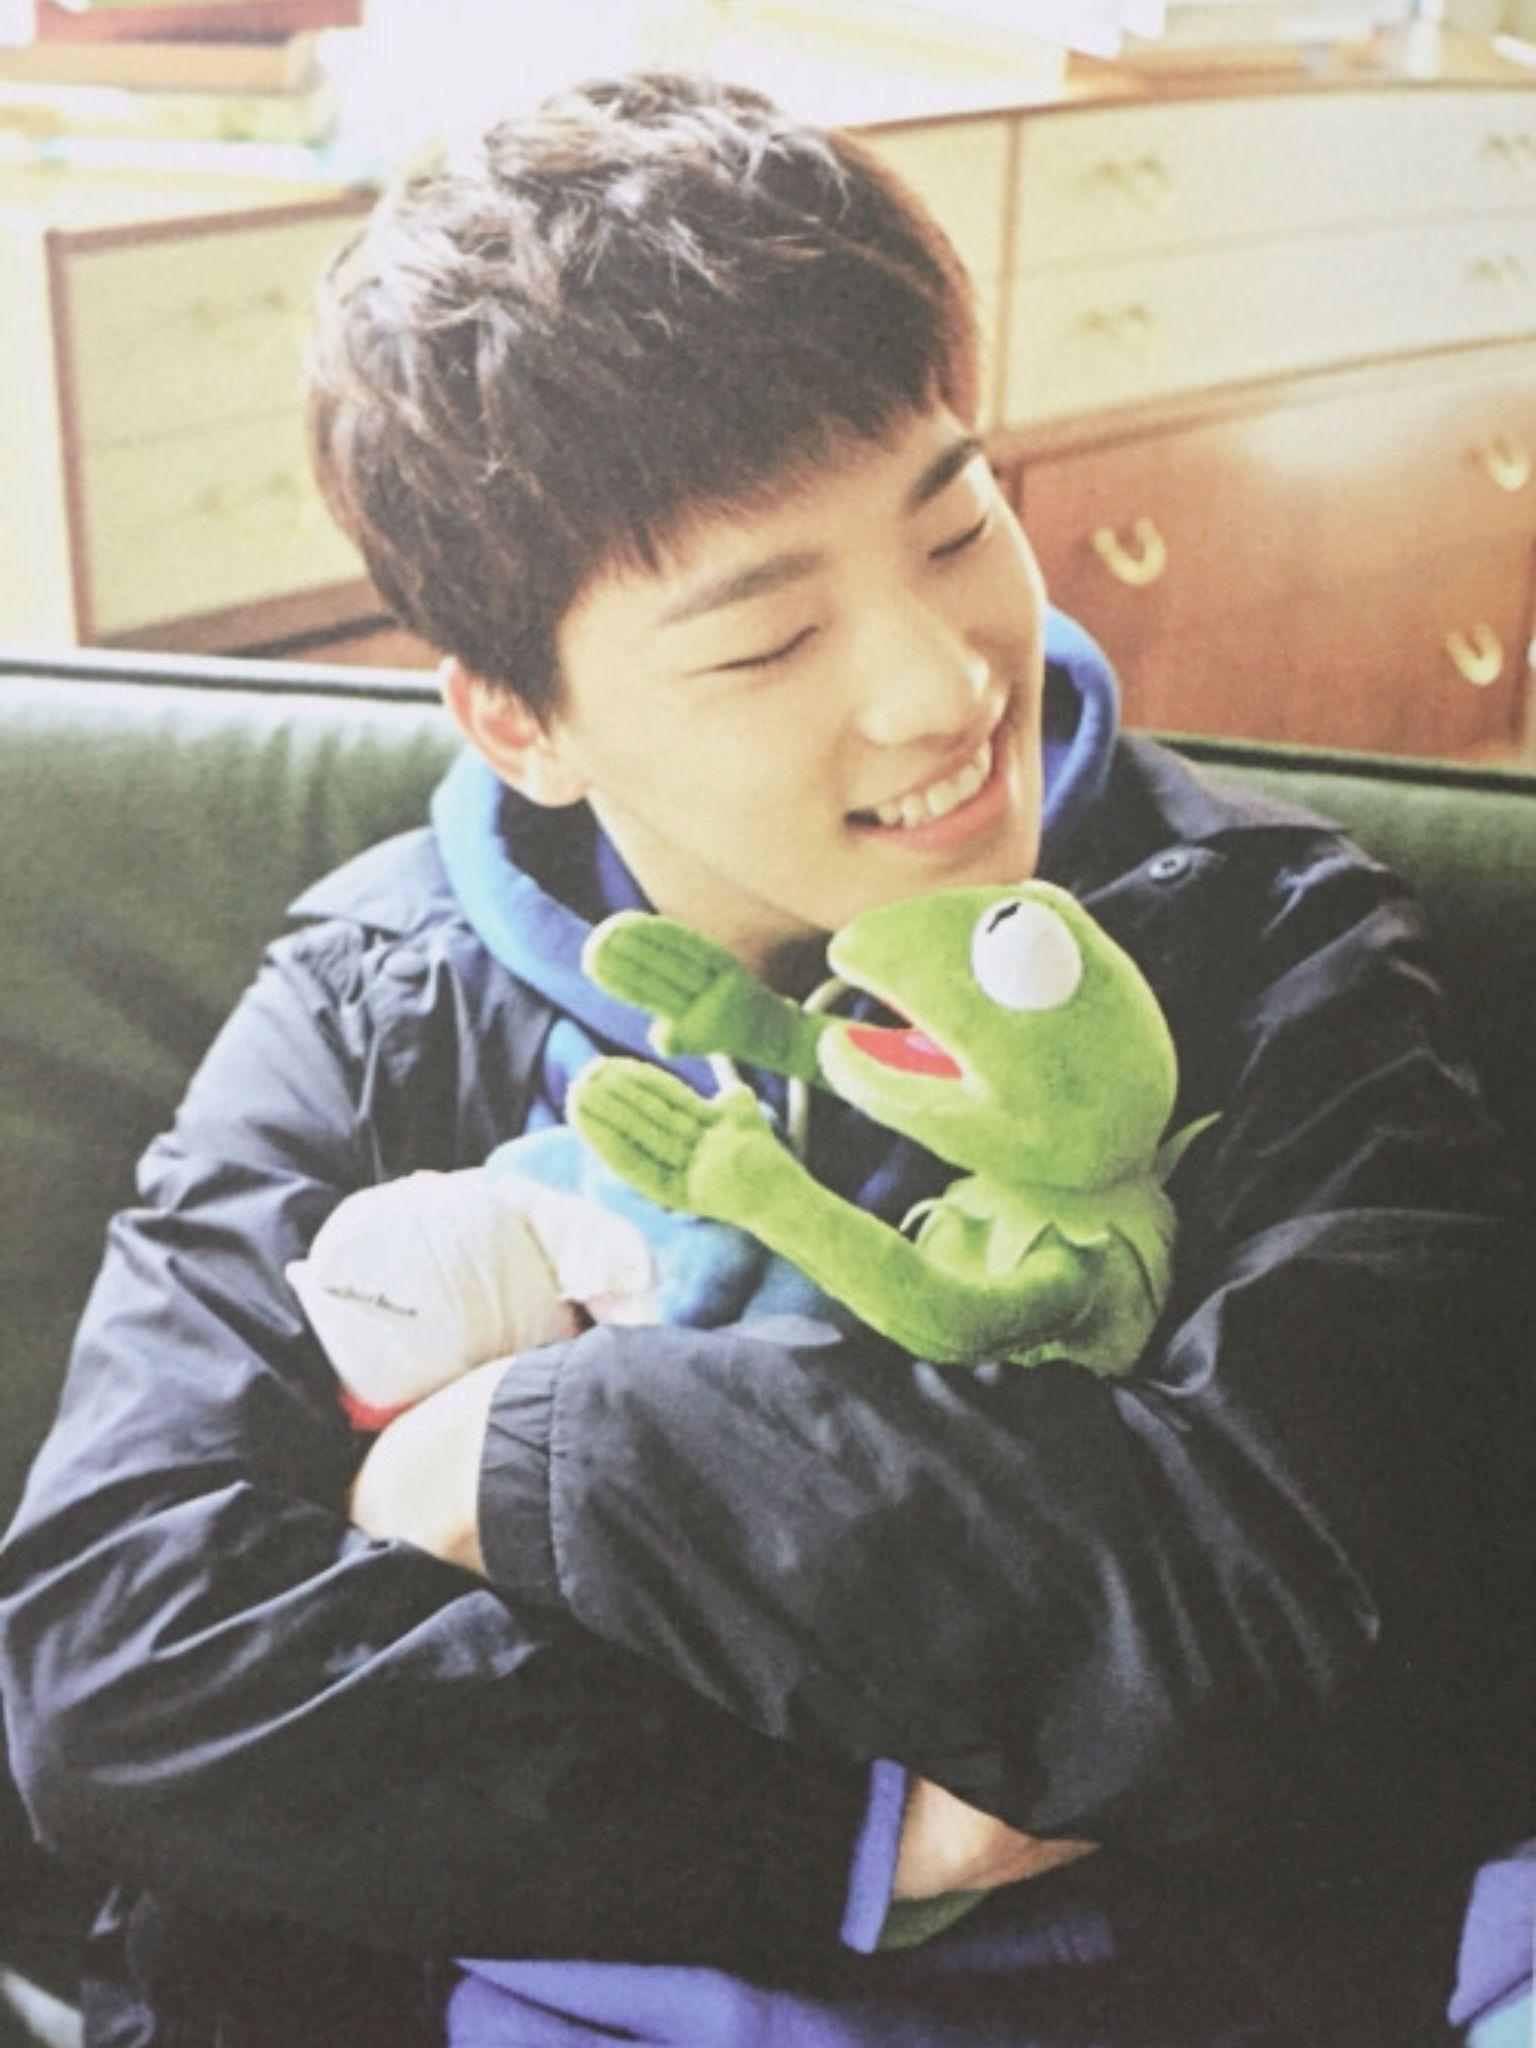 #seventeen #Dino #photoshoot